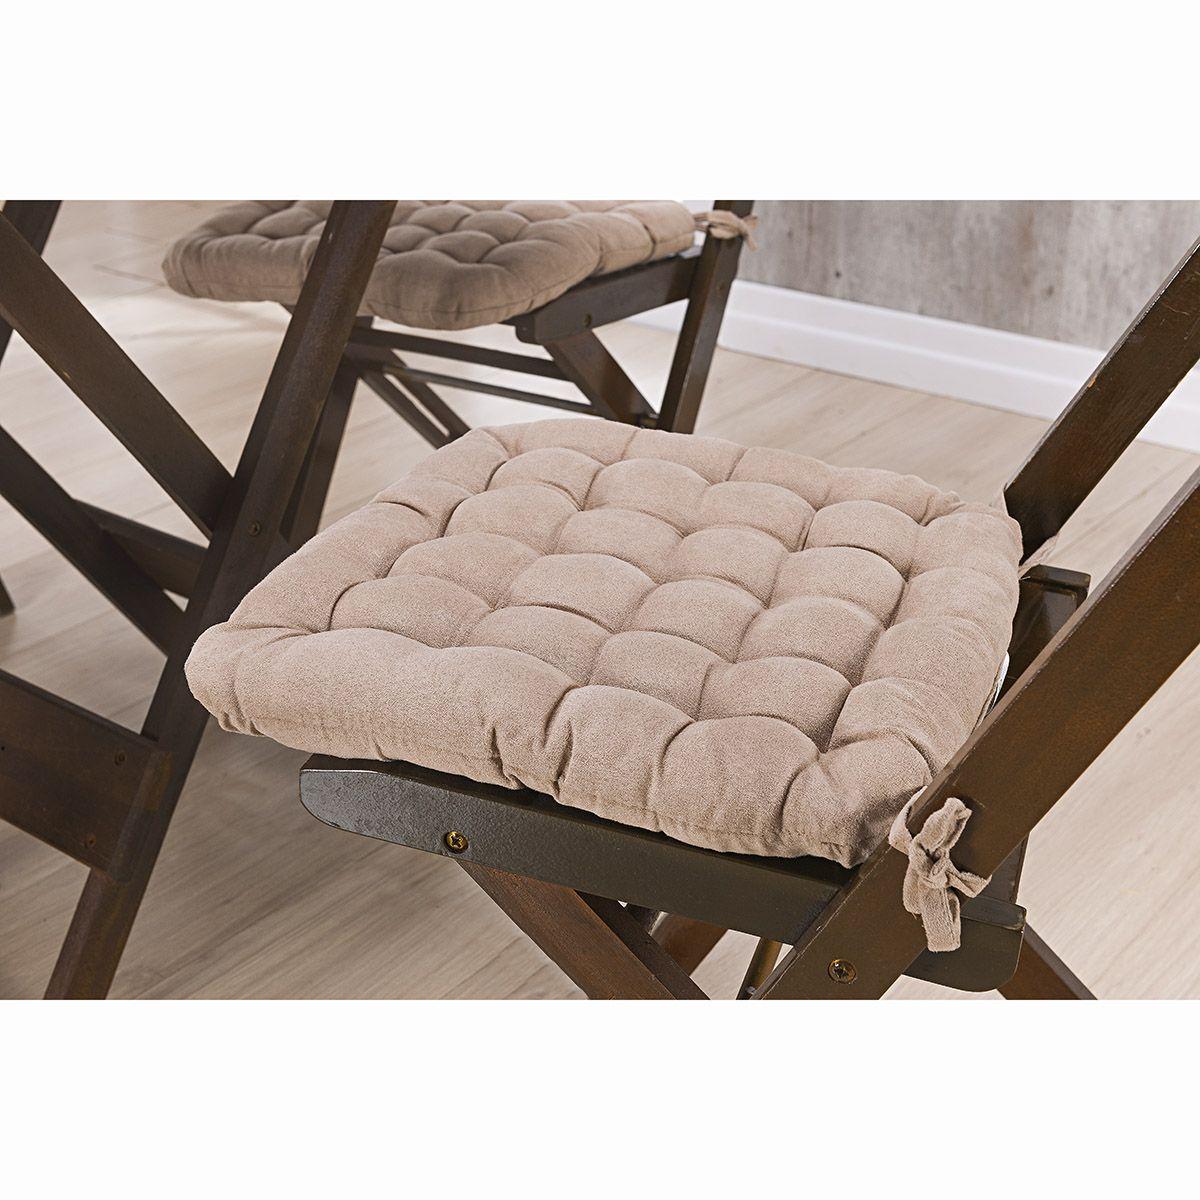 Assento P/ Cadeira - Futton - Kalamar - 40cm x 40cm - Bege - Niazitex